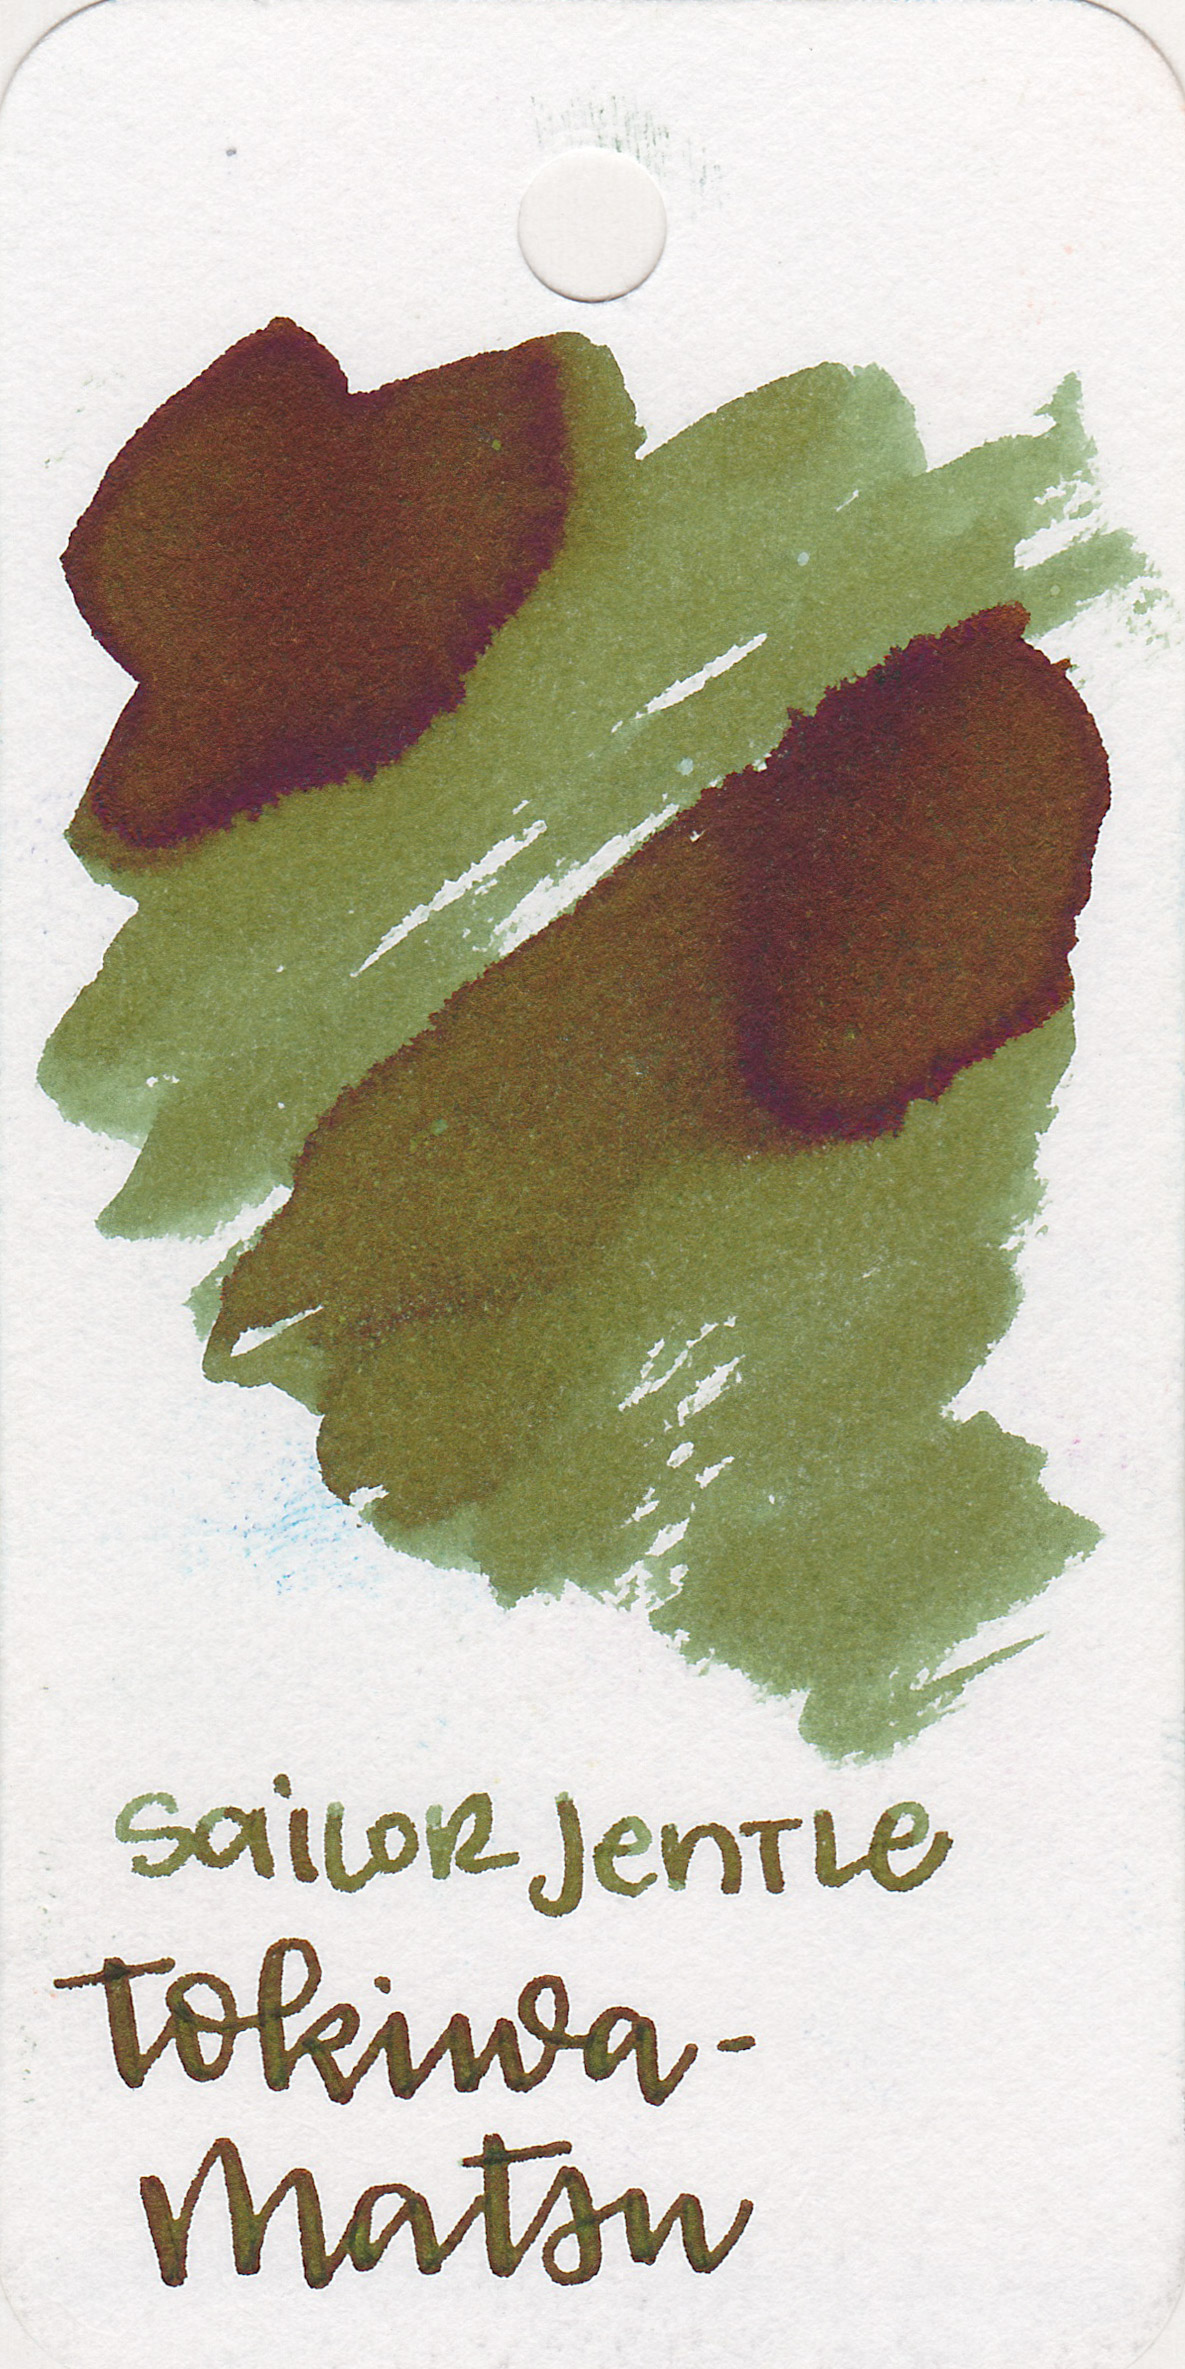 The color: - Tokiwa-matsu is a medium olive green.